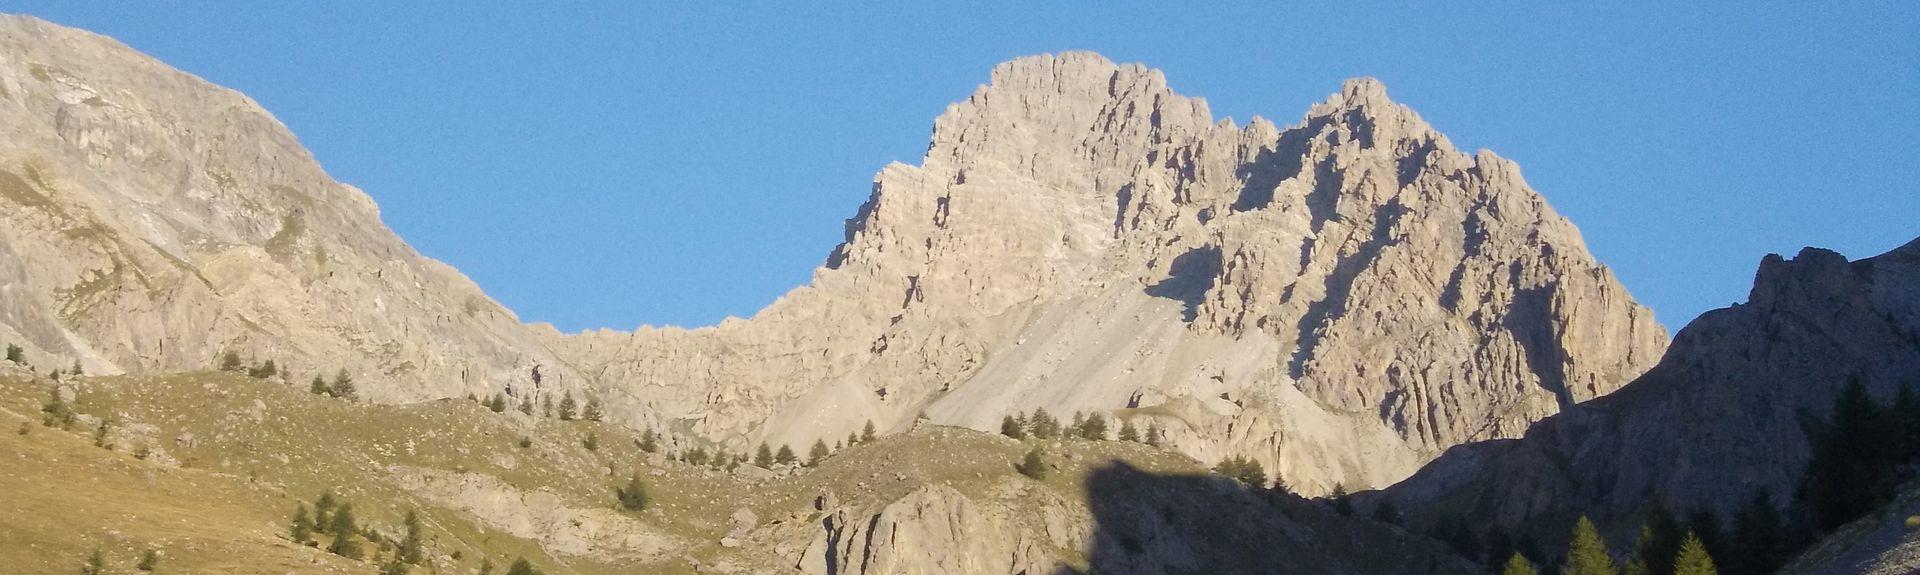 Acceglio, Cuneo, Piedmont, Italy